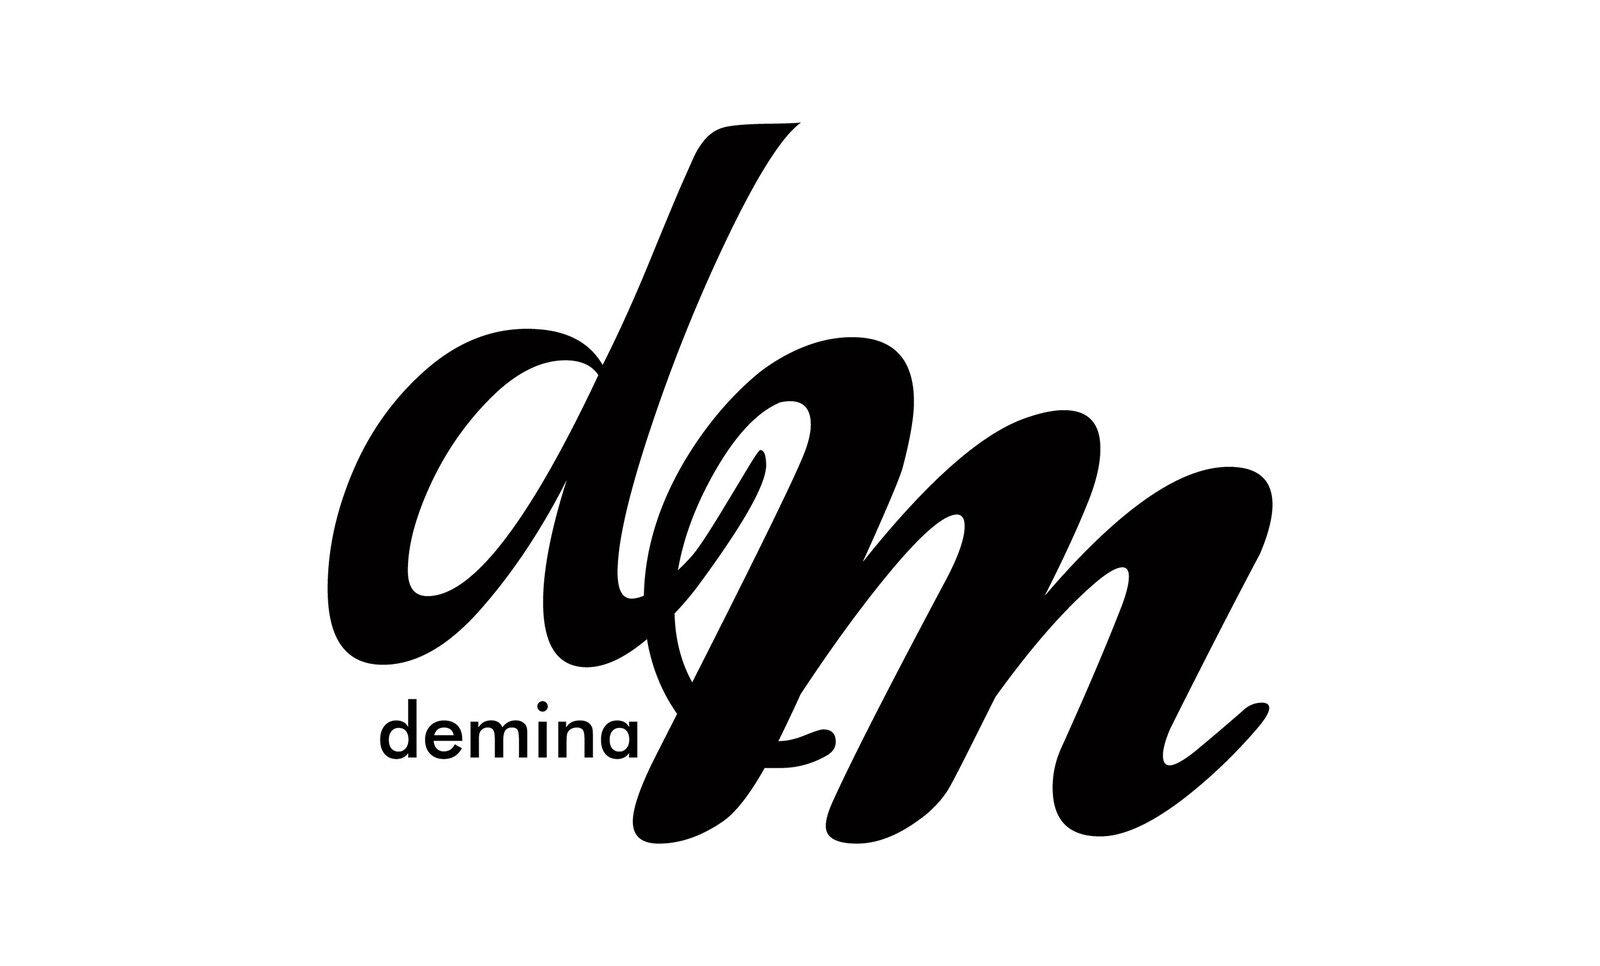 DeMina Clothing Ltd